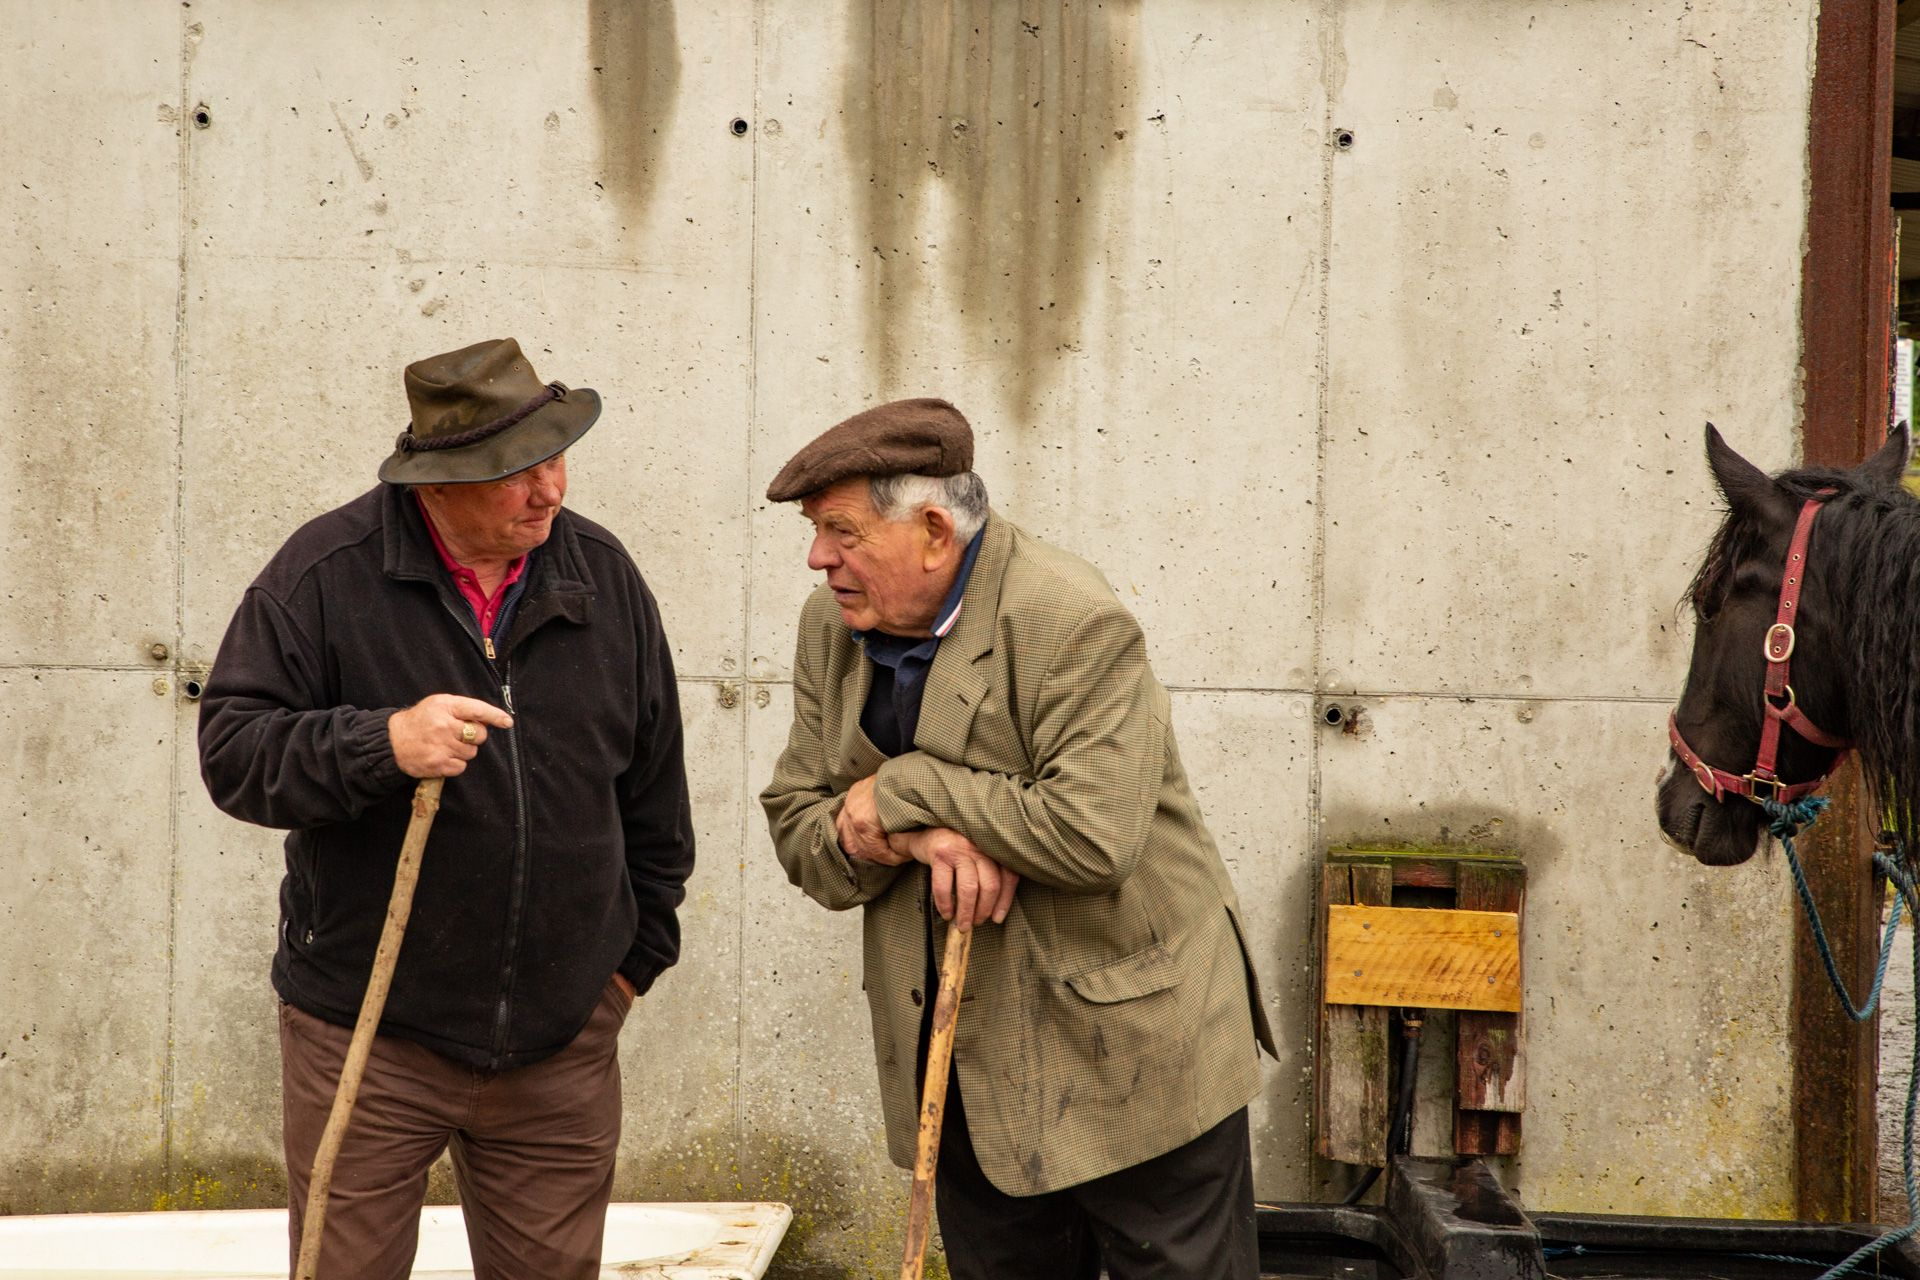 Two Irish Gentlemen and  a Horse's Head, Stancill Ireland